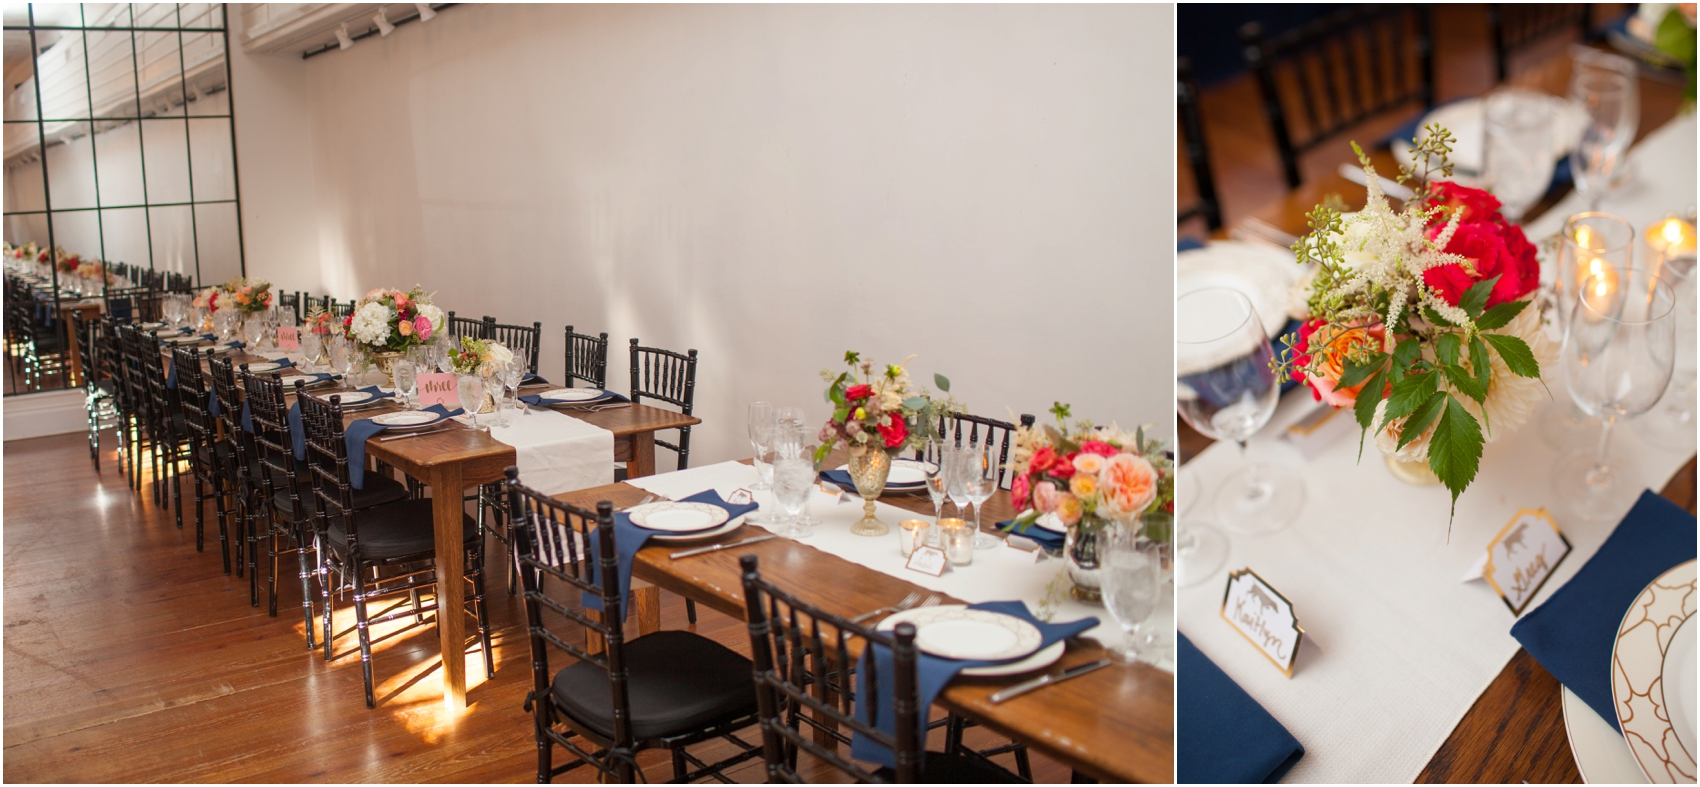 Old-Metropolitan-Hall-Wedding-Charlottesville-Virginia-597.jpg